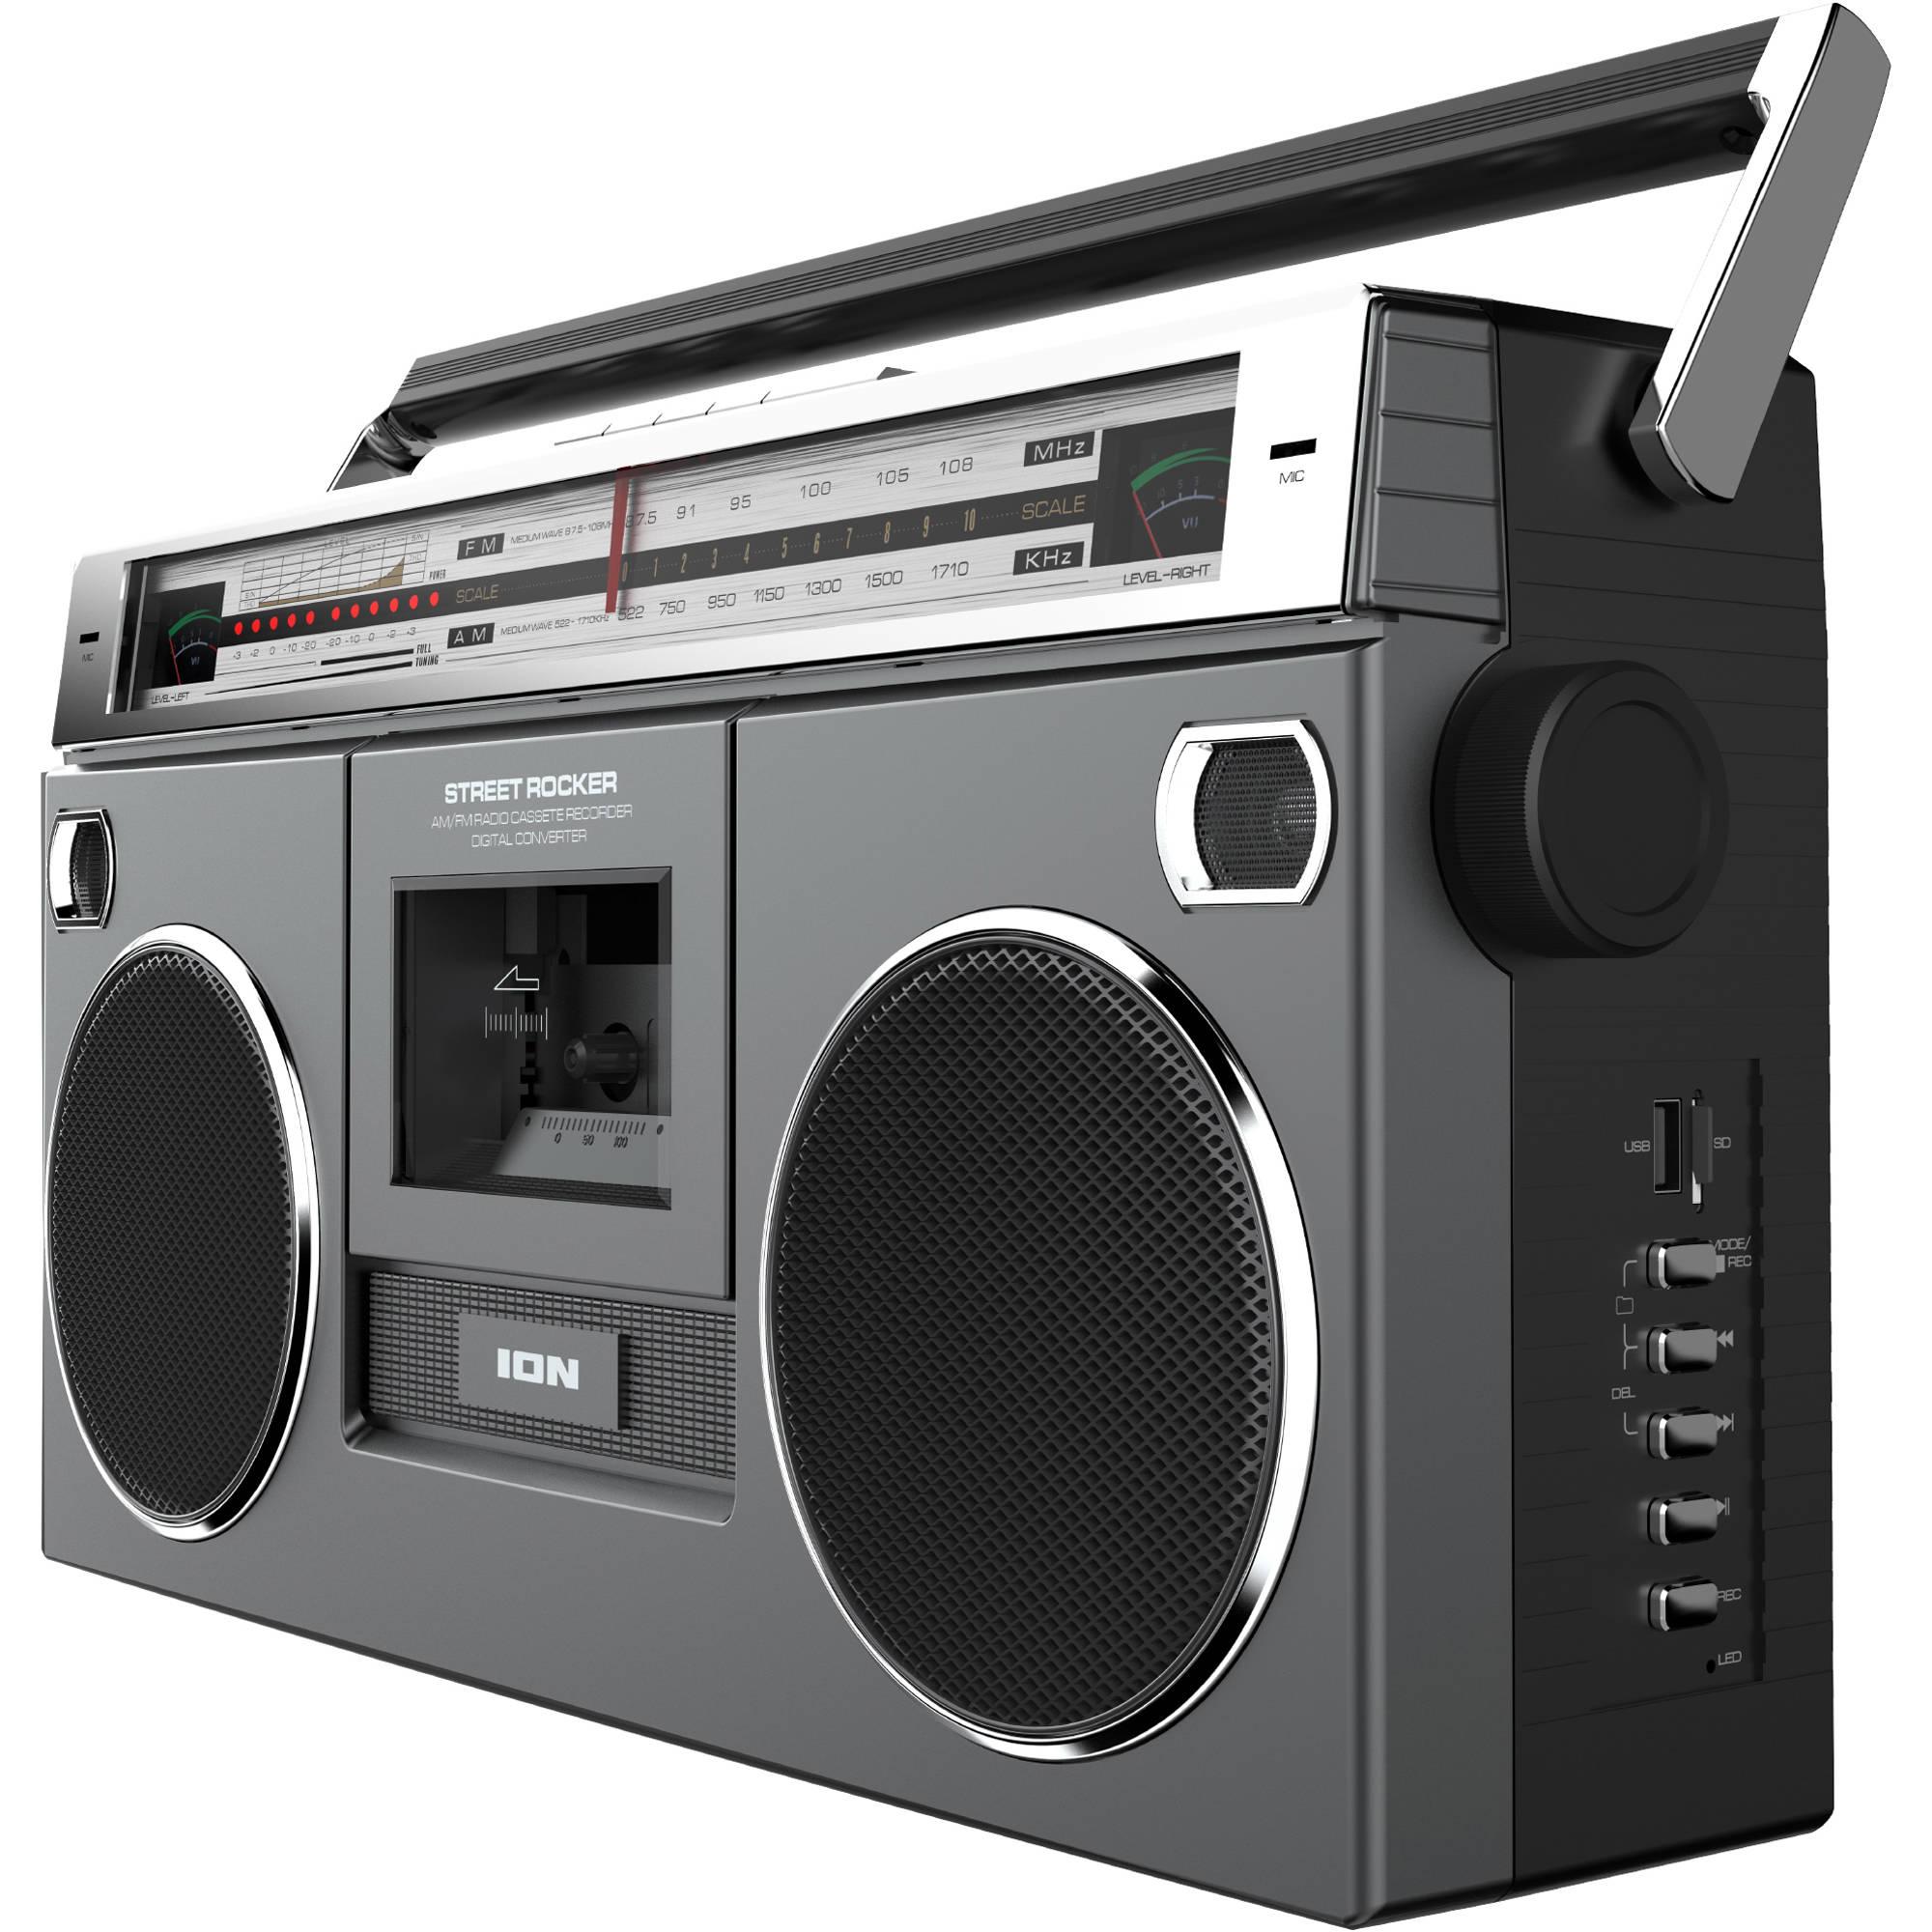 Boombox Speaker Wireless Touch Battery 80s Retro NFC ... |80s Boombox